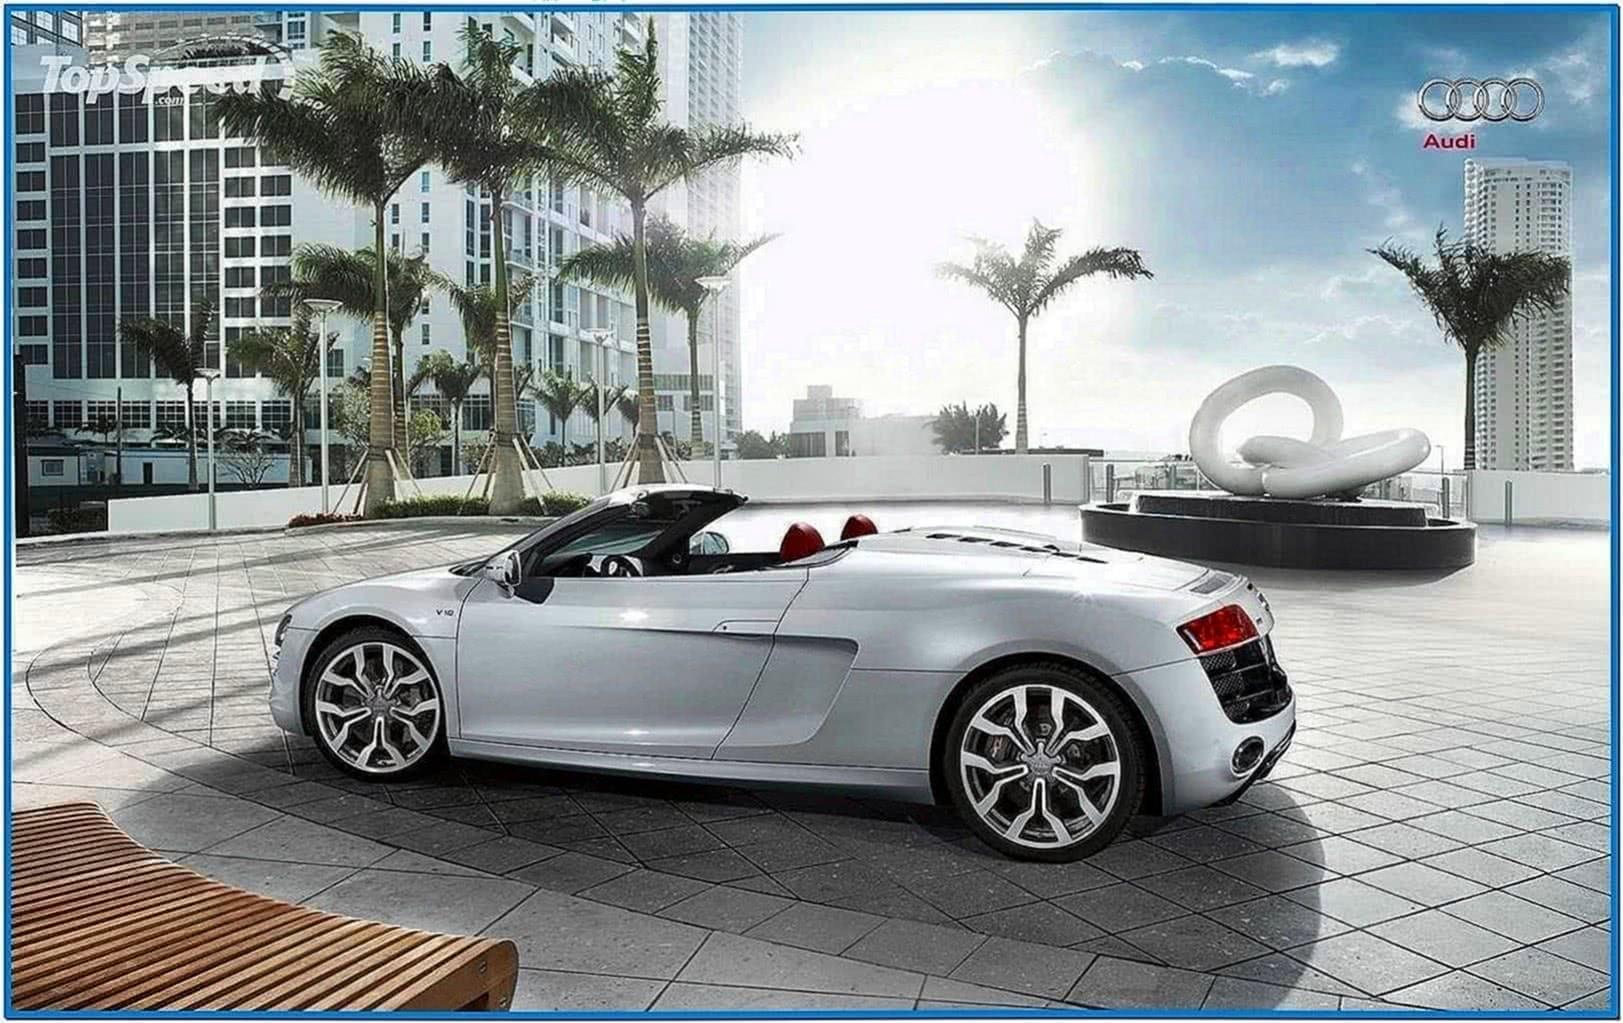 Audi r8 spyder screensaver